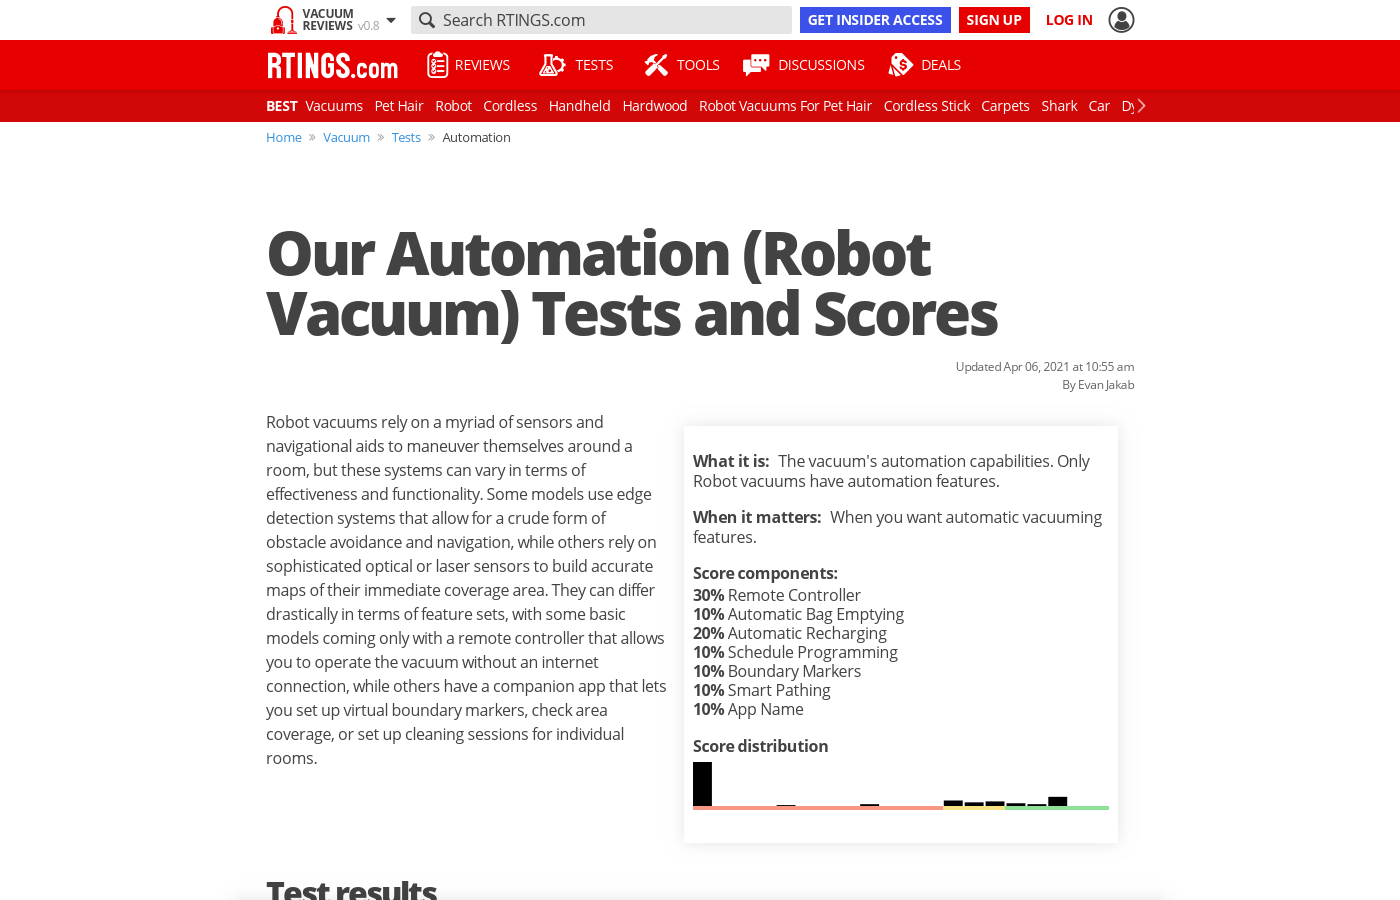 Our Vacuum Tests: Automation (Robot Vacuum)